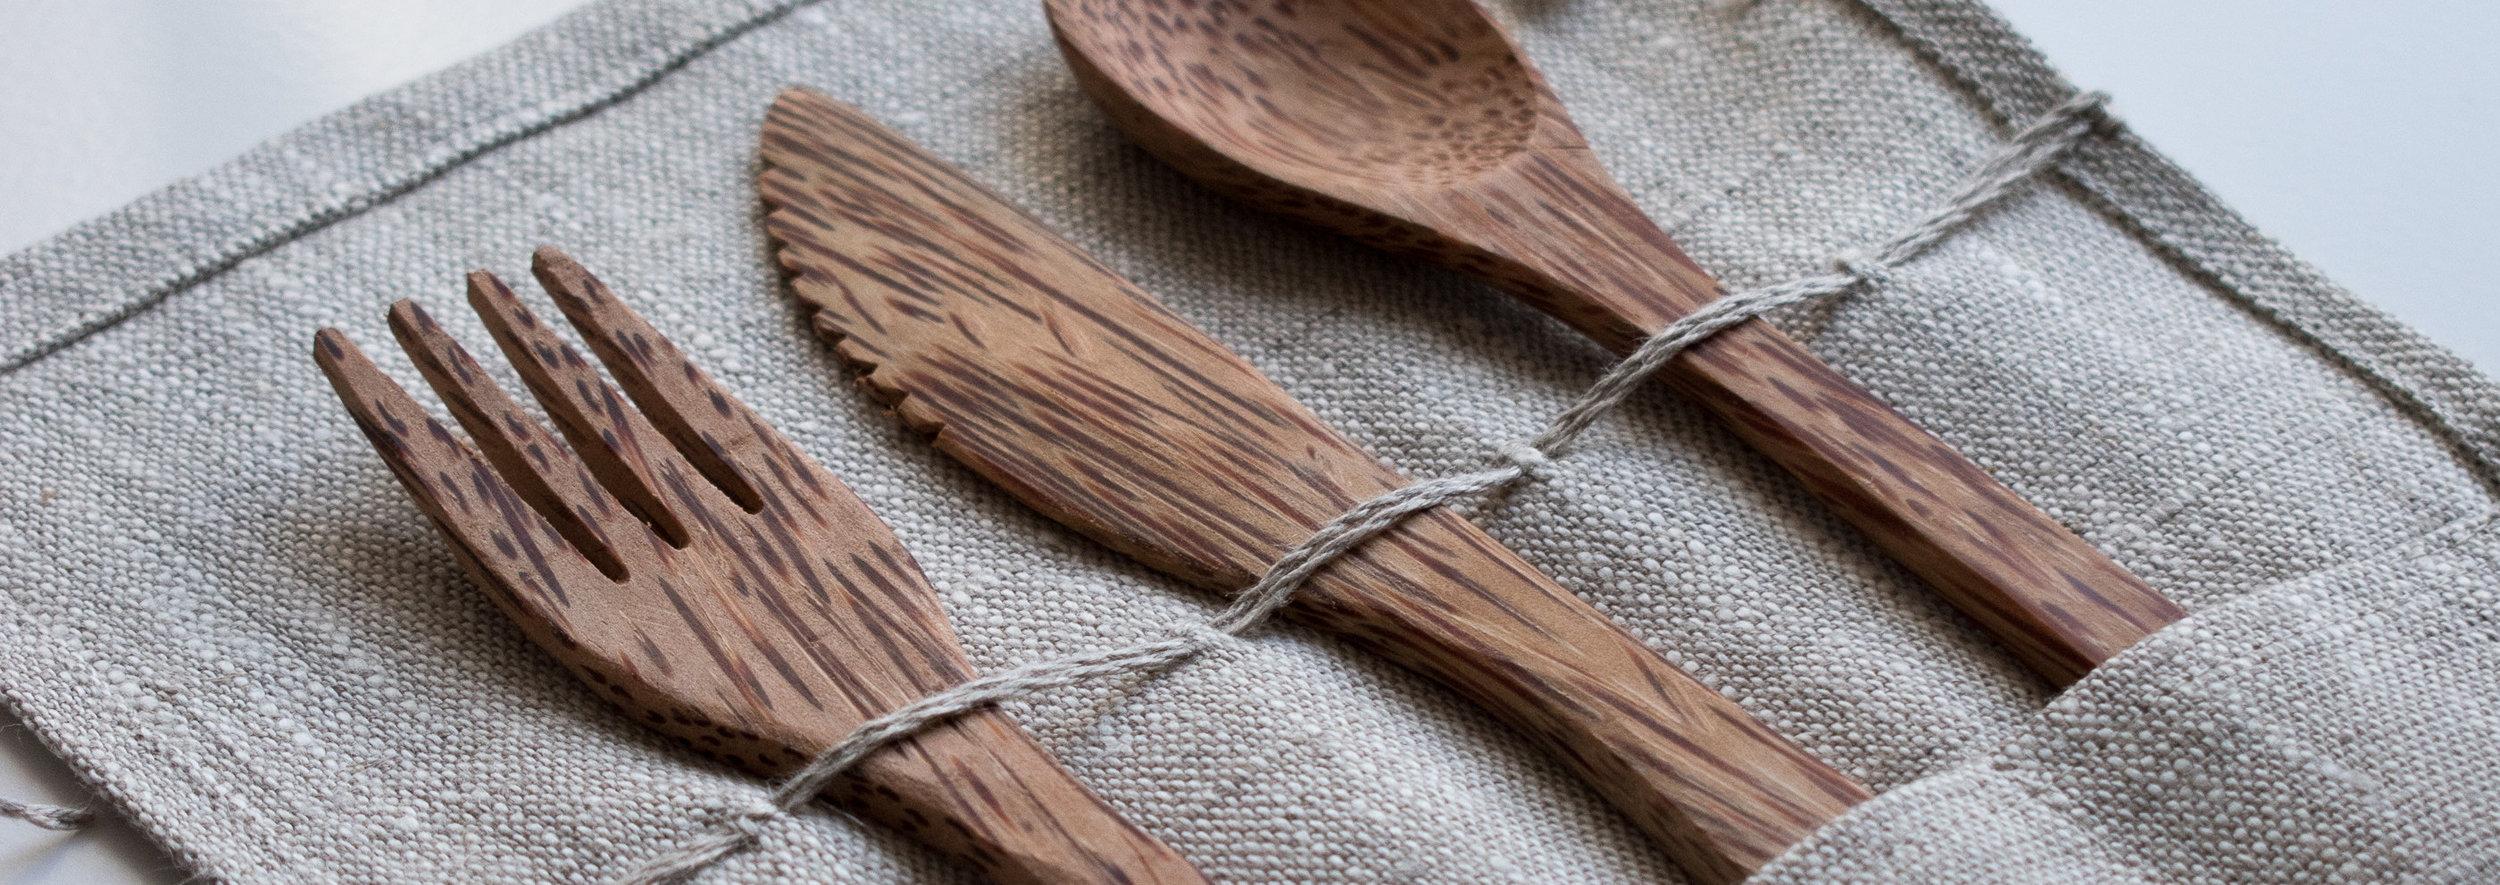 sustainable-cutlery.jpg